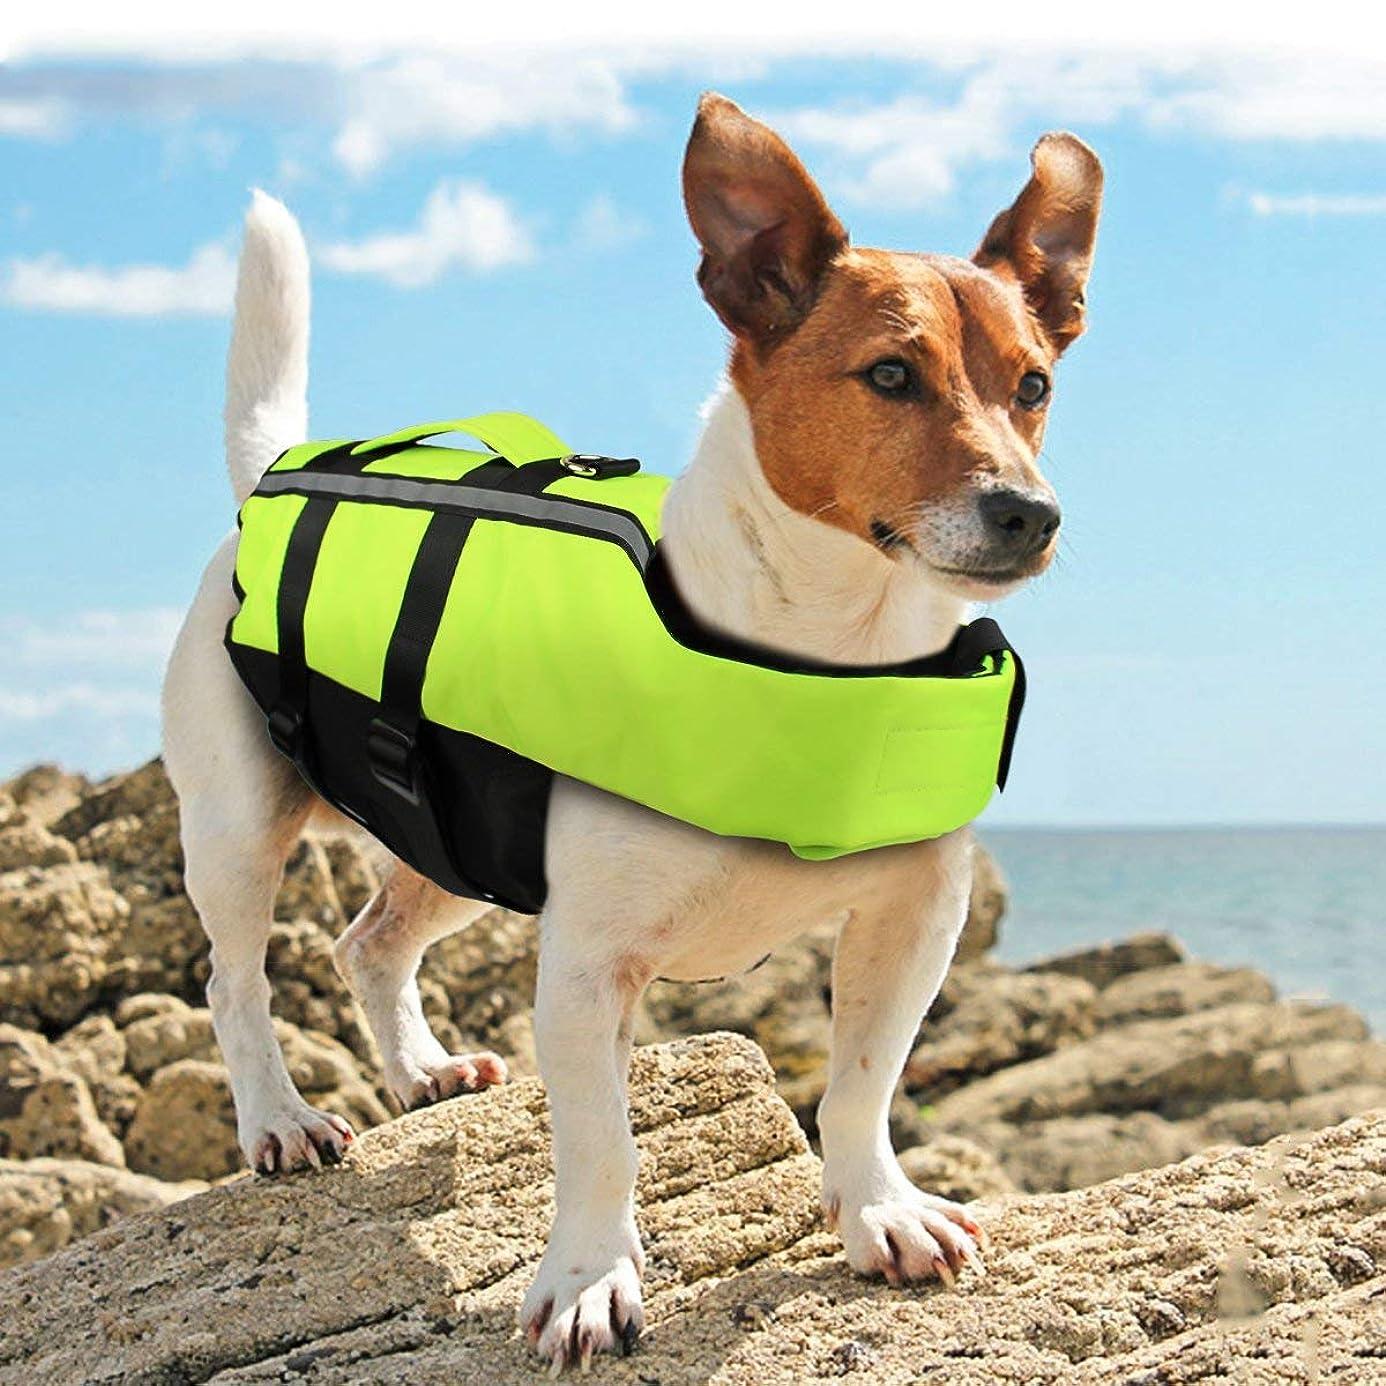 Namsan Dog Life Jacket - Folding Dog Life Vest,Portable Airbag Dog Swimming Jacket Vest,Green azn7244337